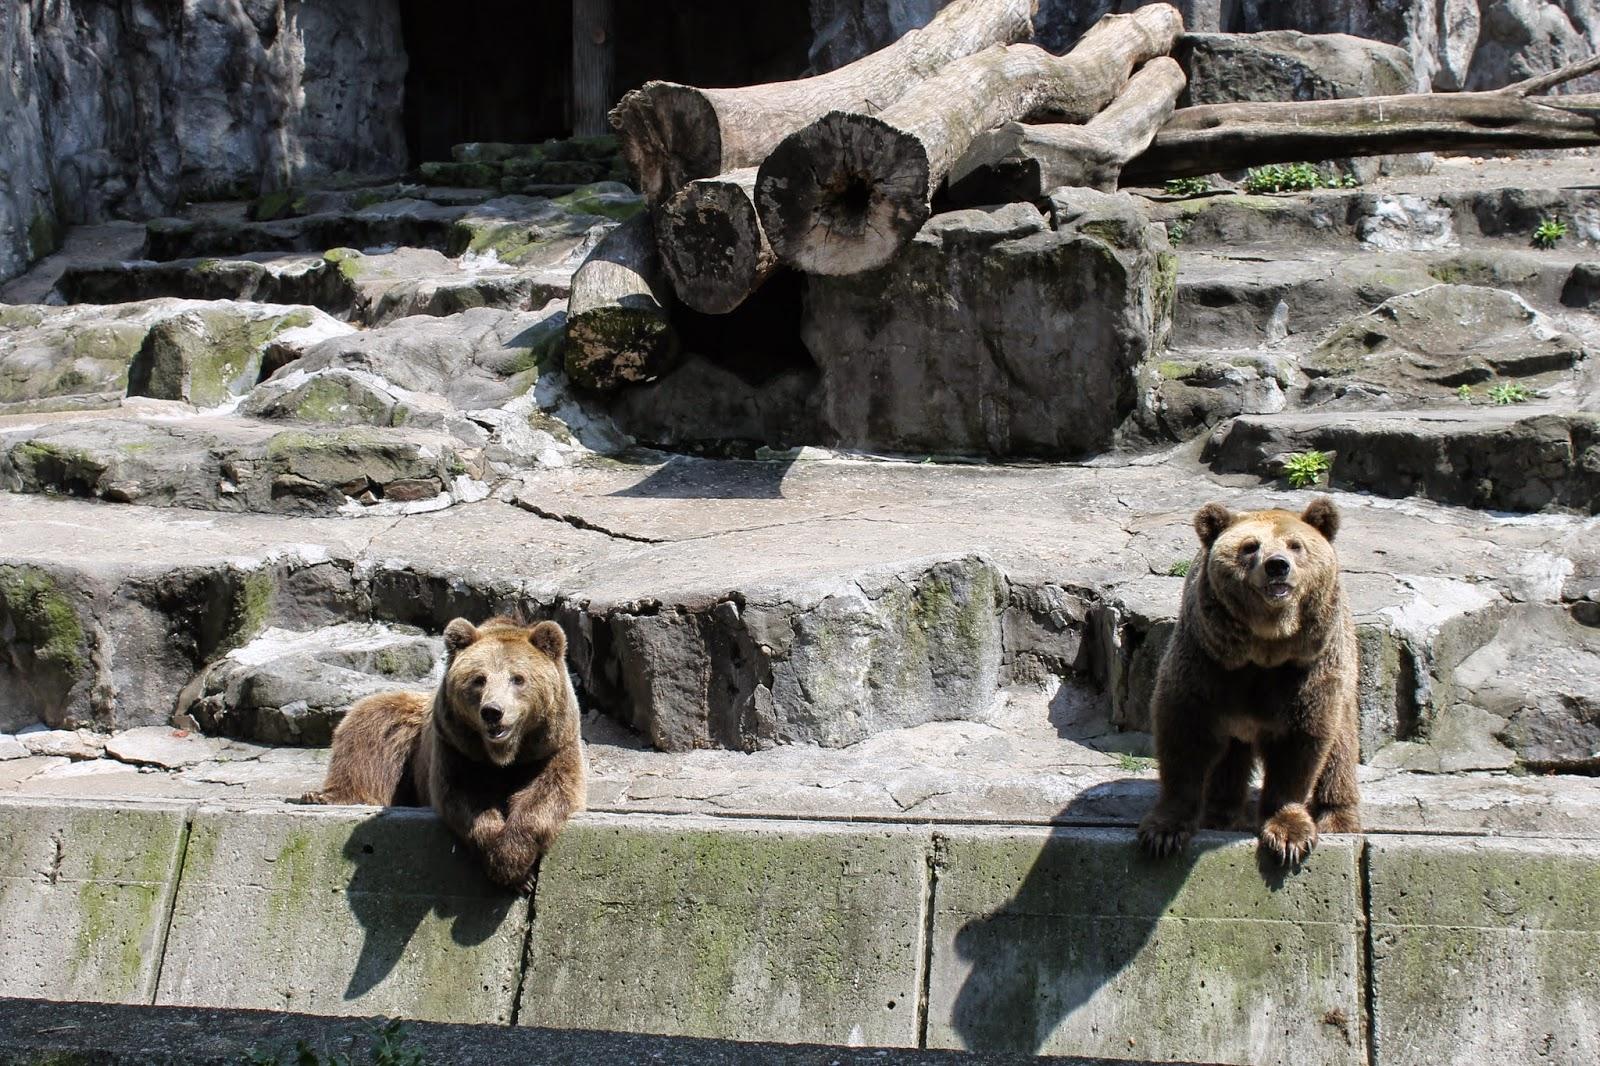 Seoul Zoo, Seoul, зоопарк в сеуле, сеул, корея, зоопарк, медведи